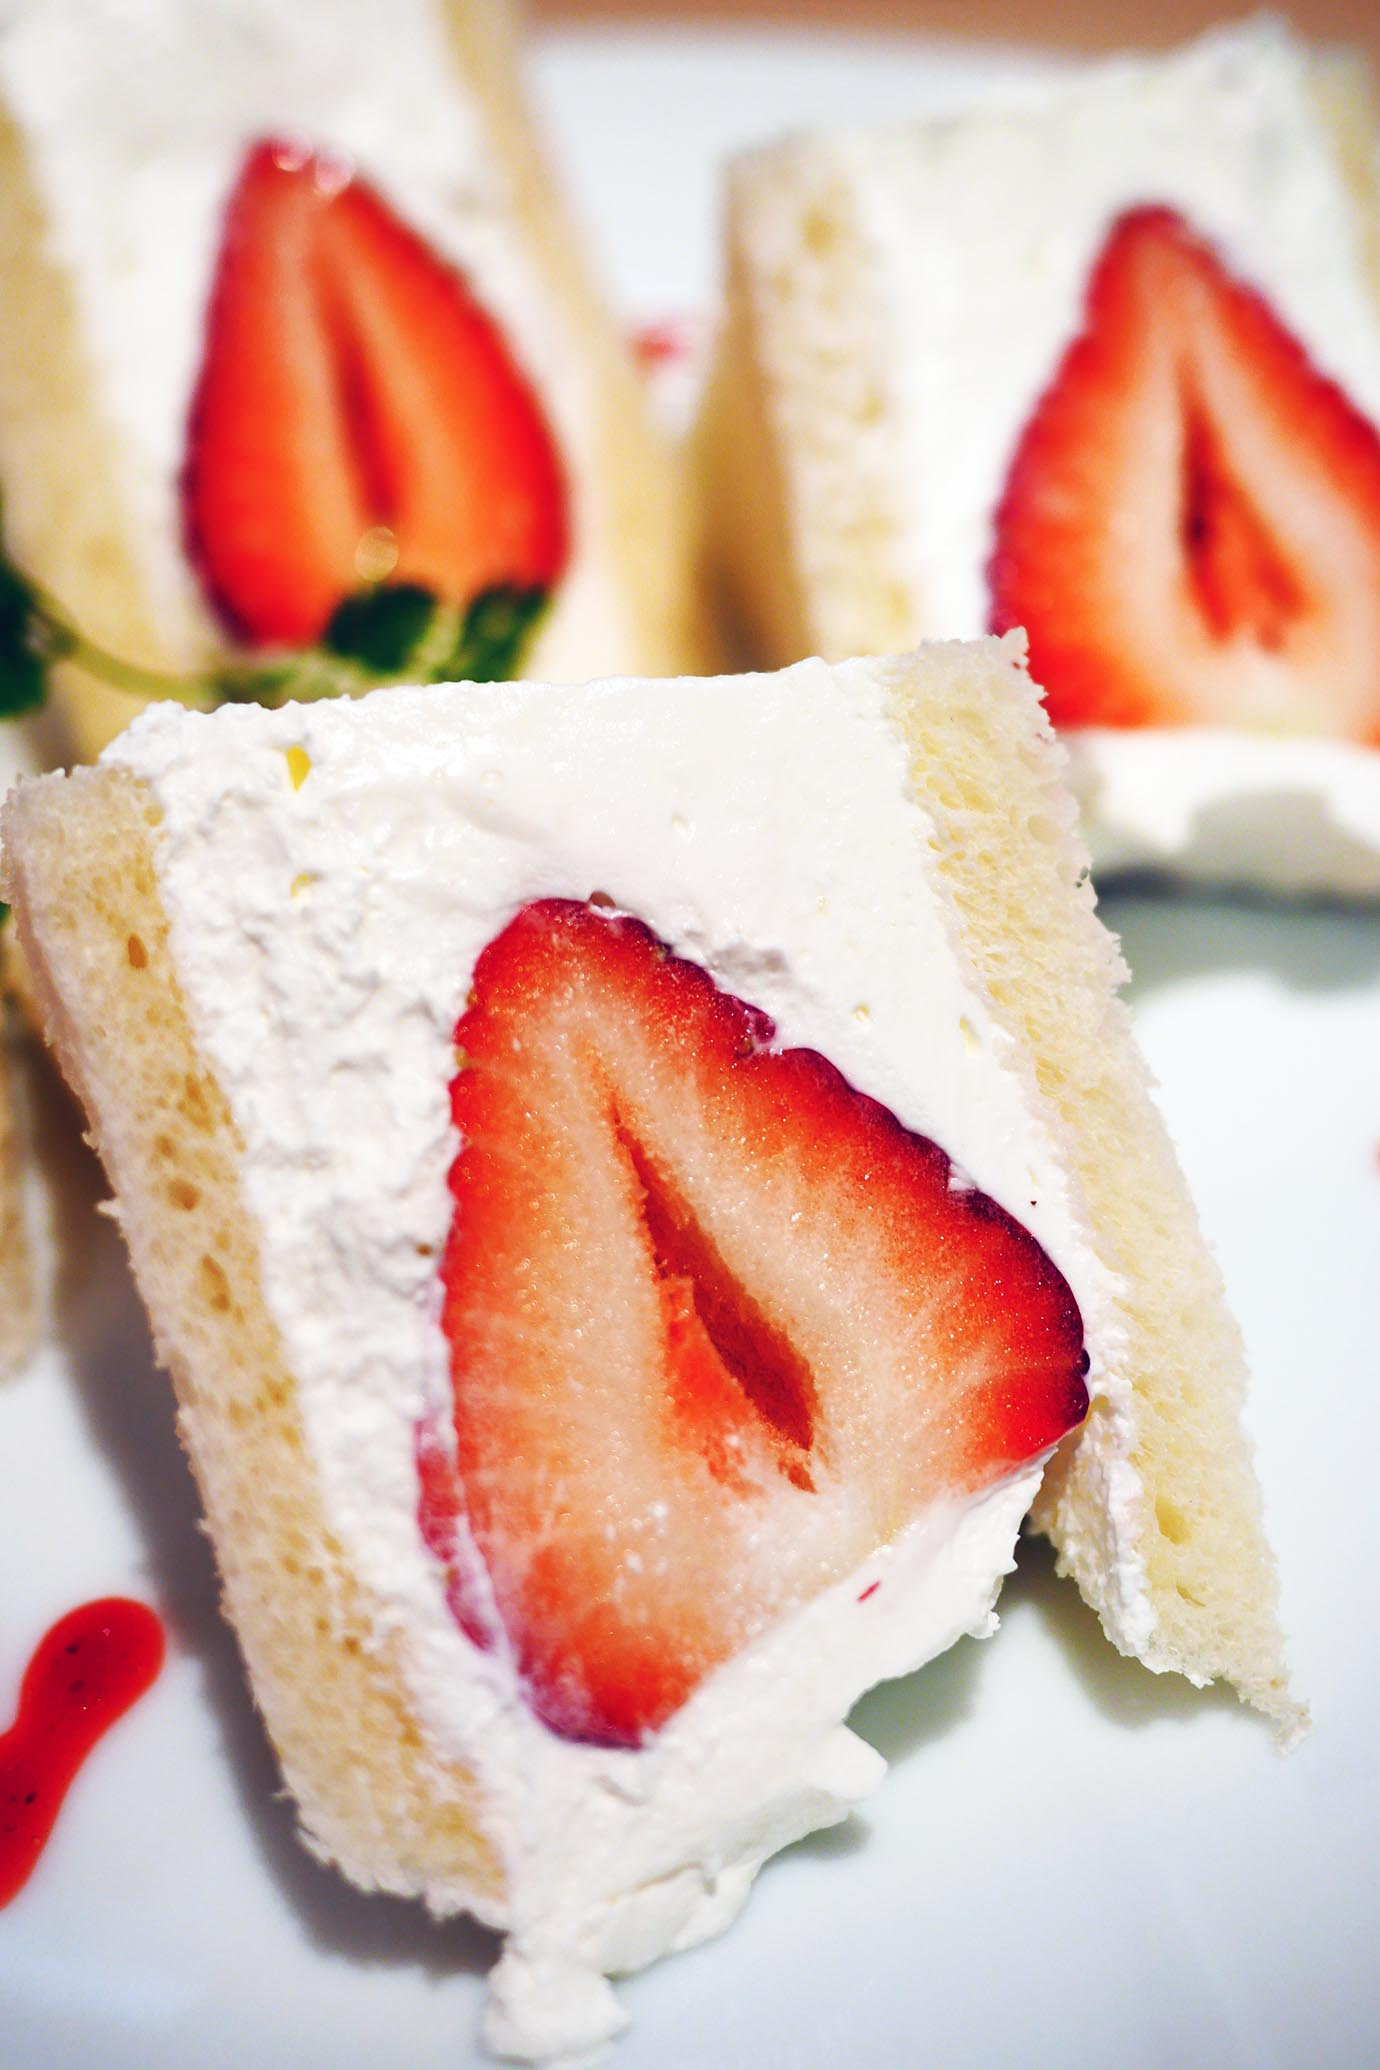 strawberry-sandwich